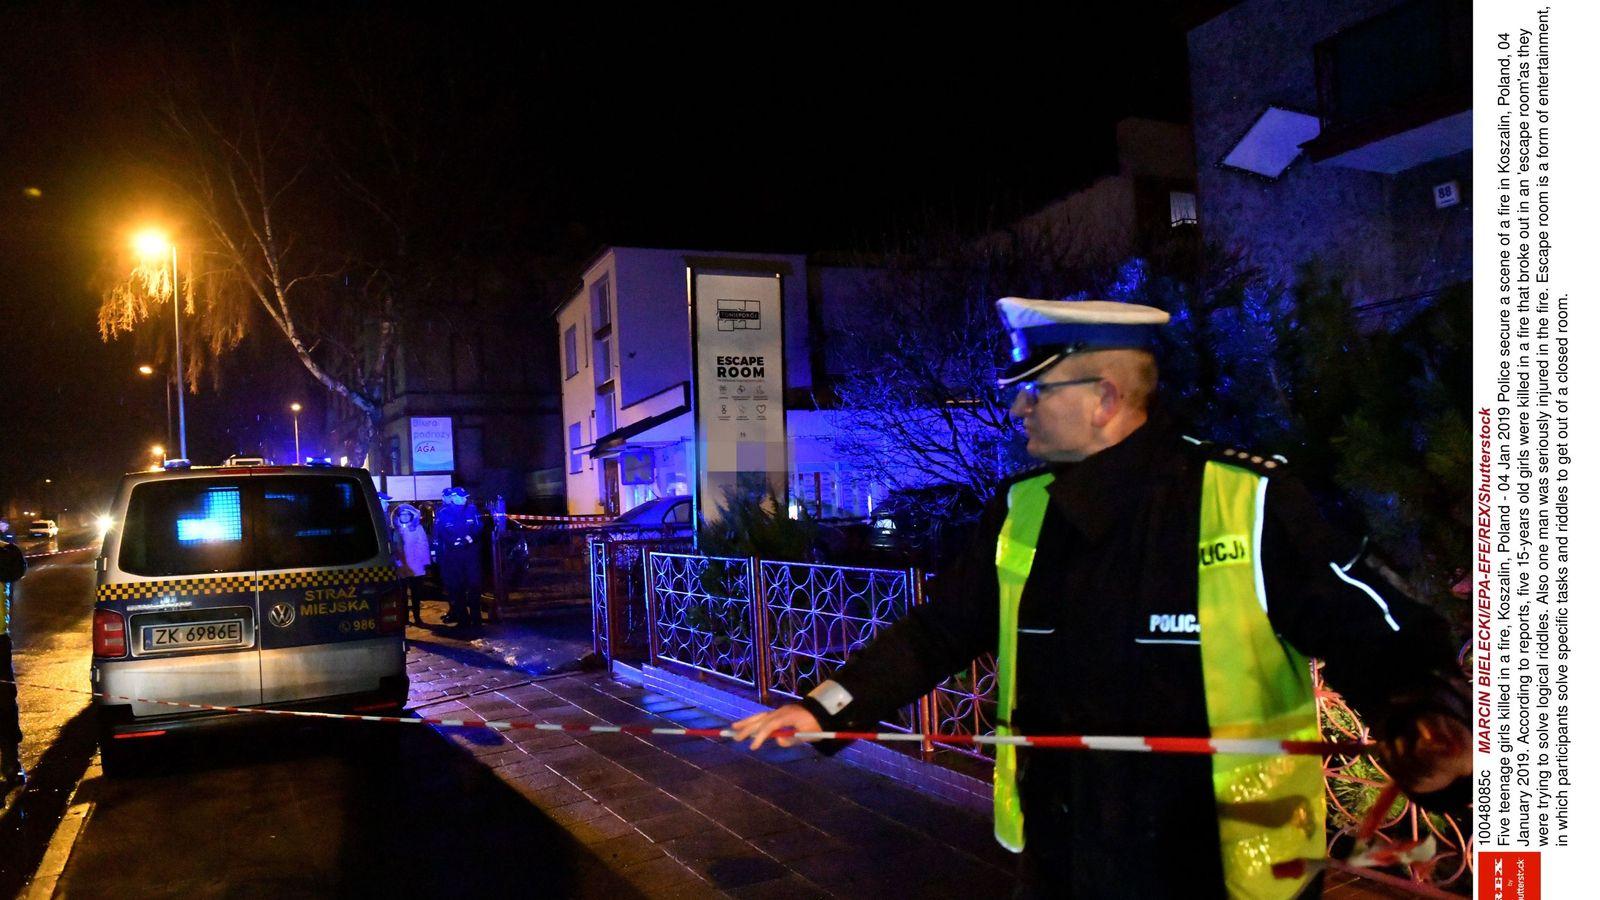 Five teenage girls 'celebrating birthday' die in escape room fire